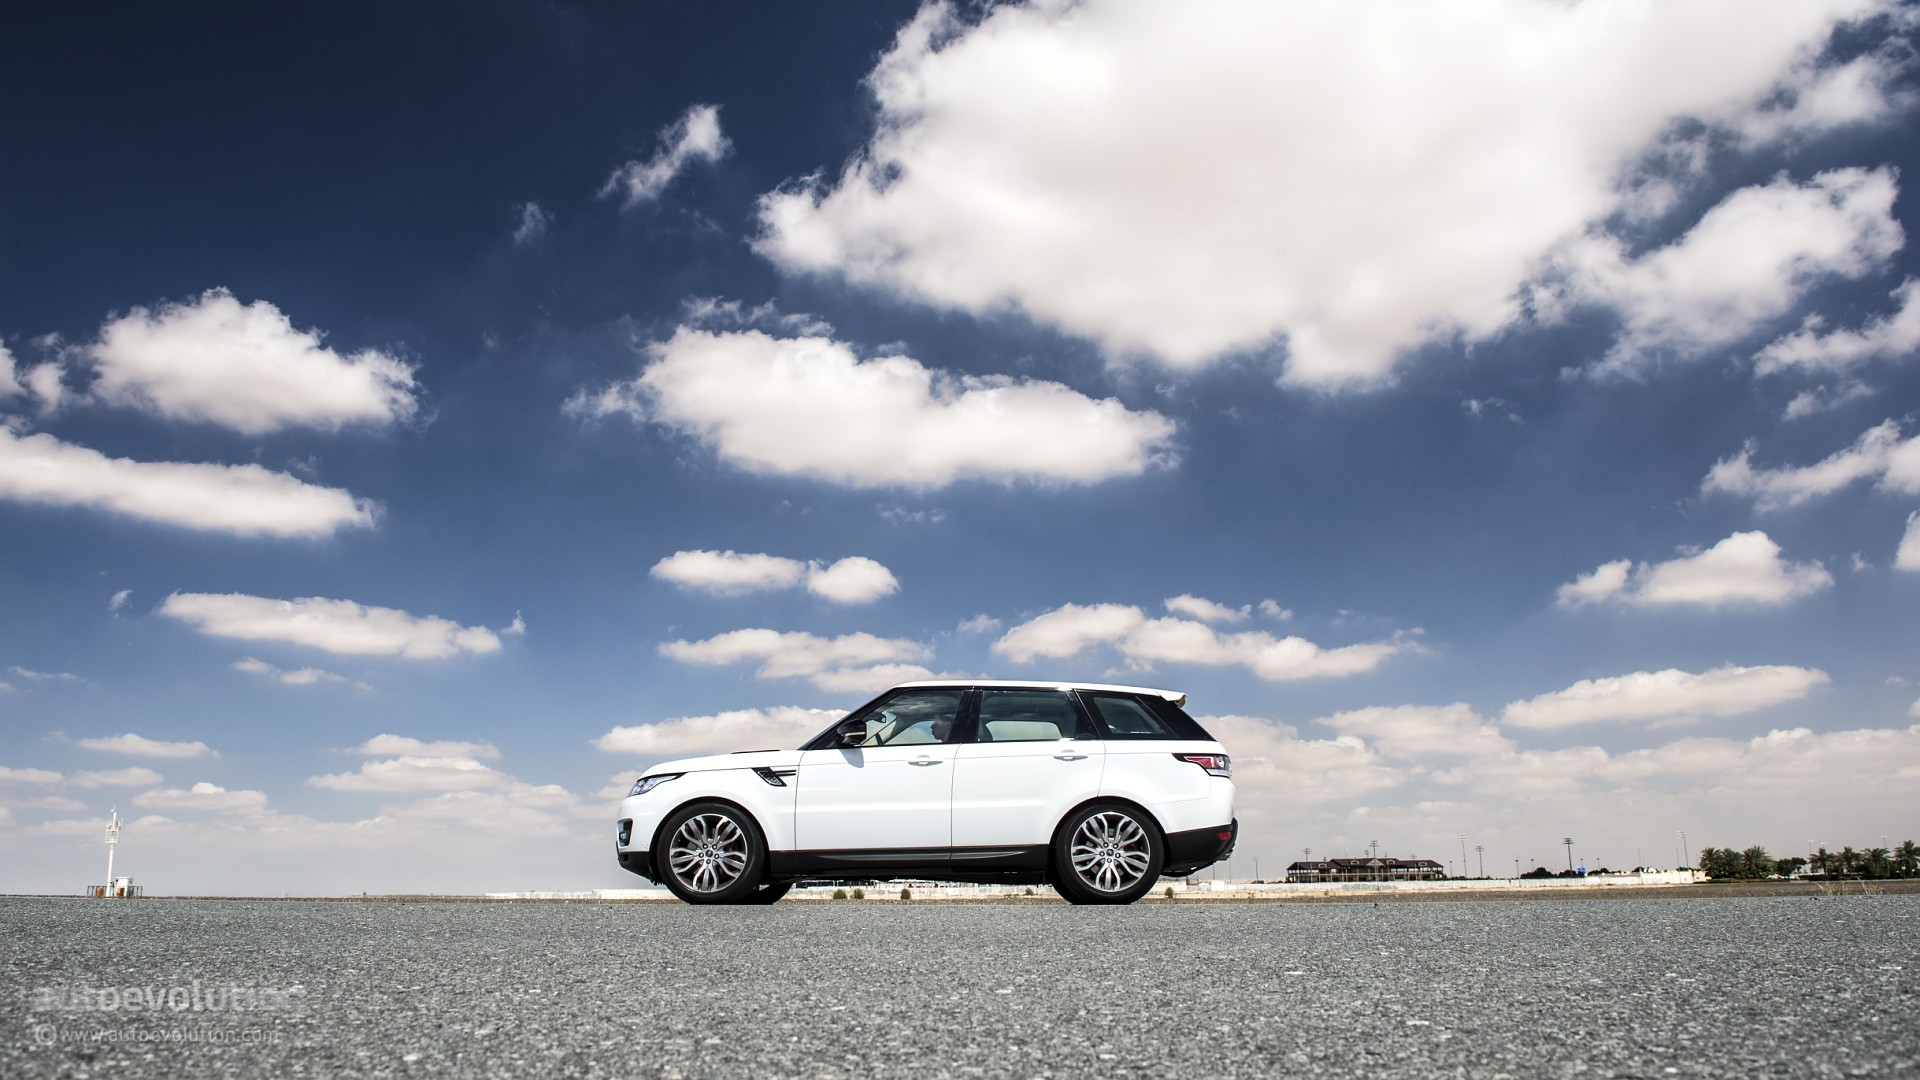 Range Rover Sport Supercharged In Dubai S Desert Hd Wallpapers